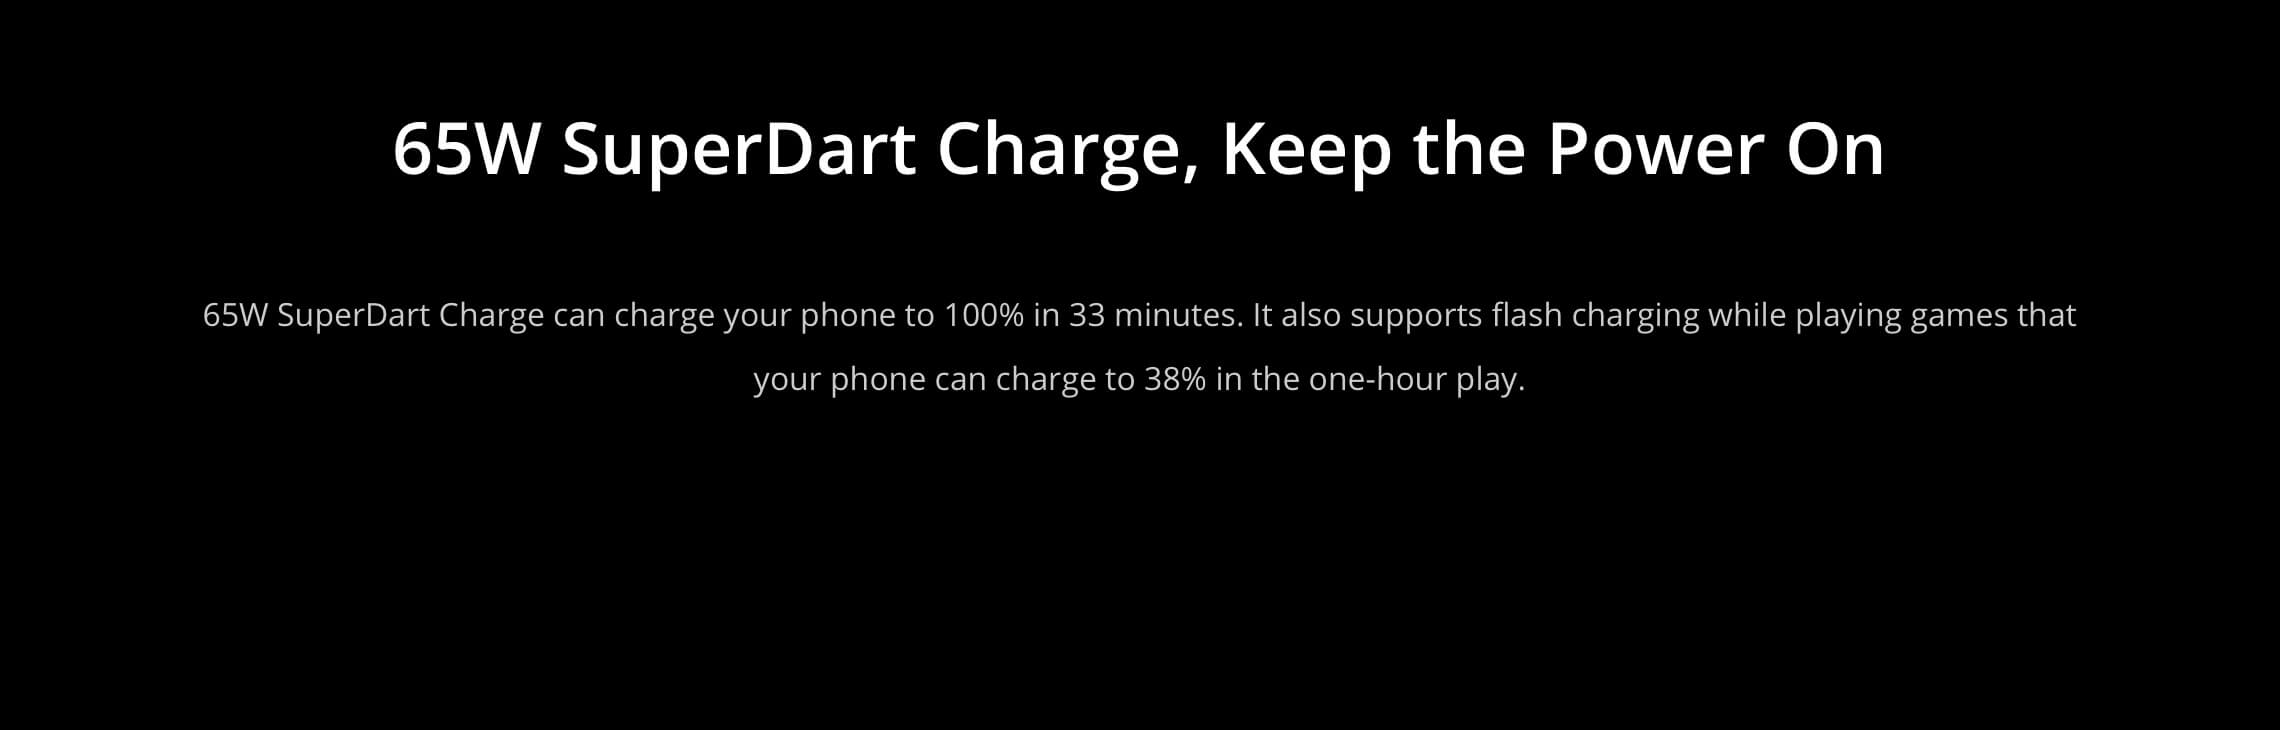 Realme GT Master Edition superdart charger